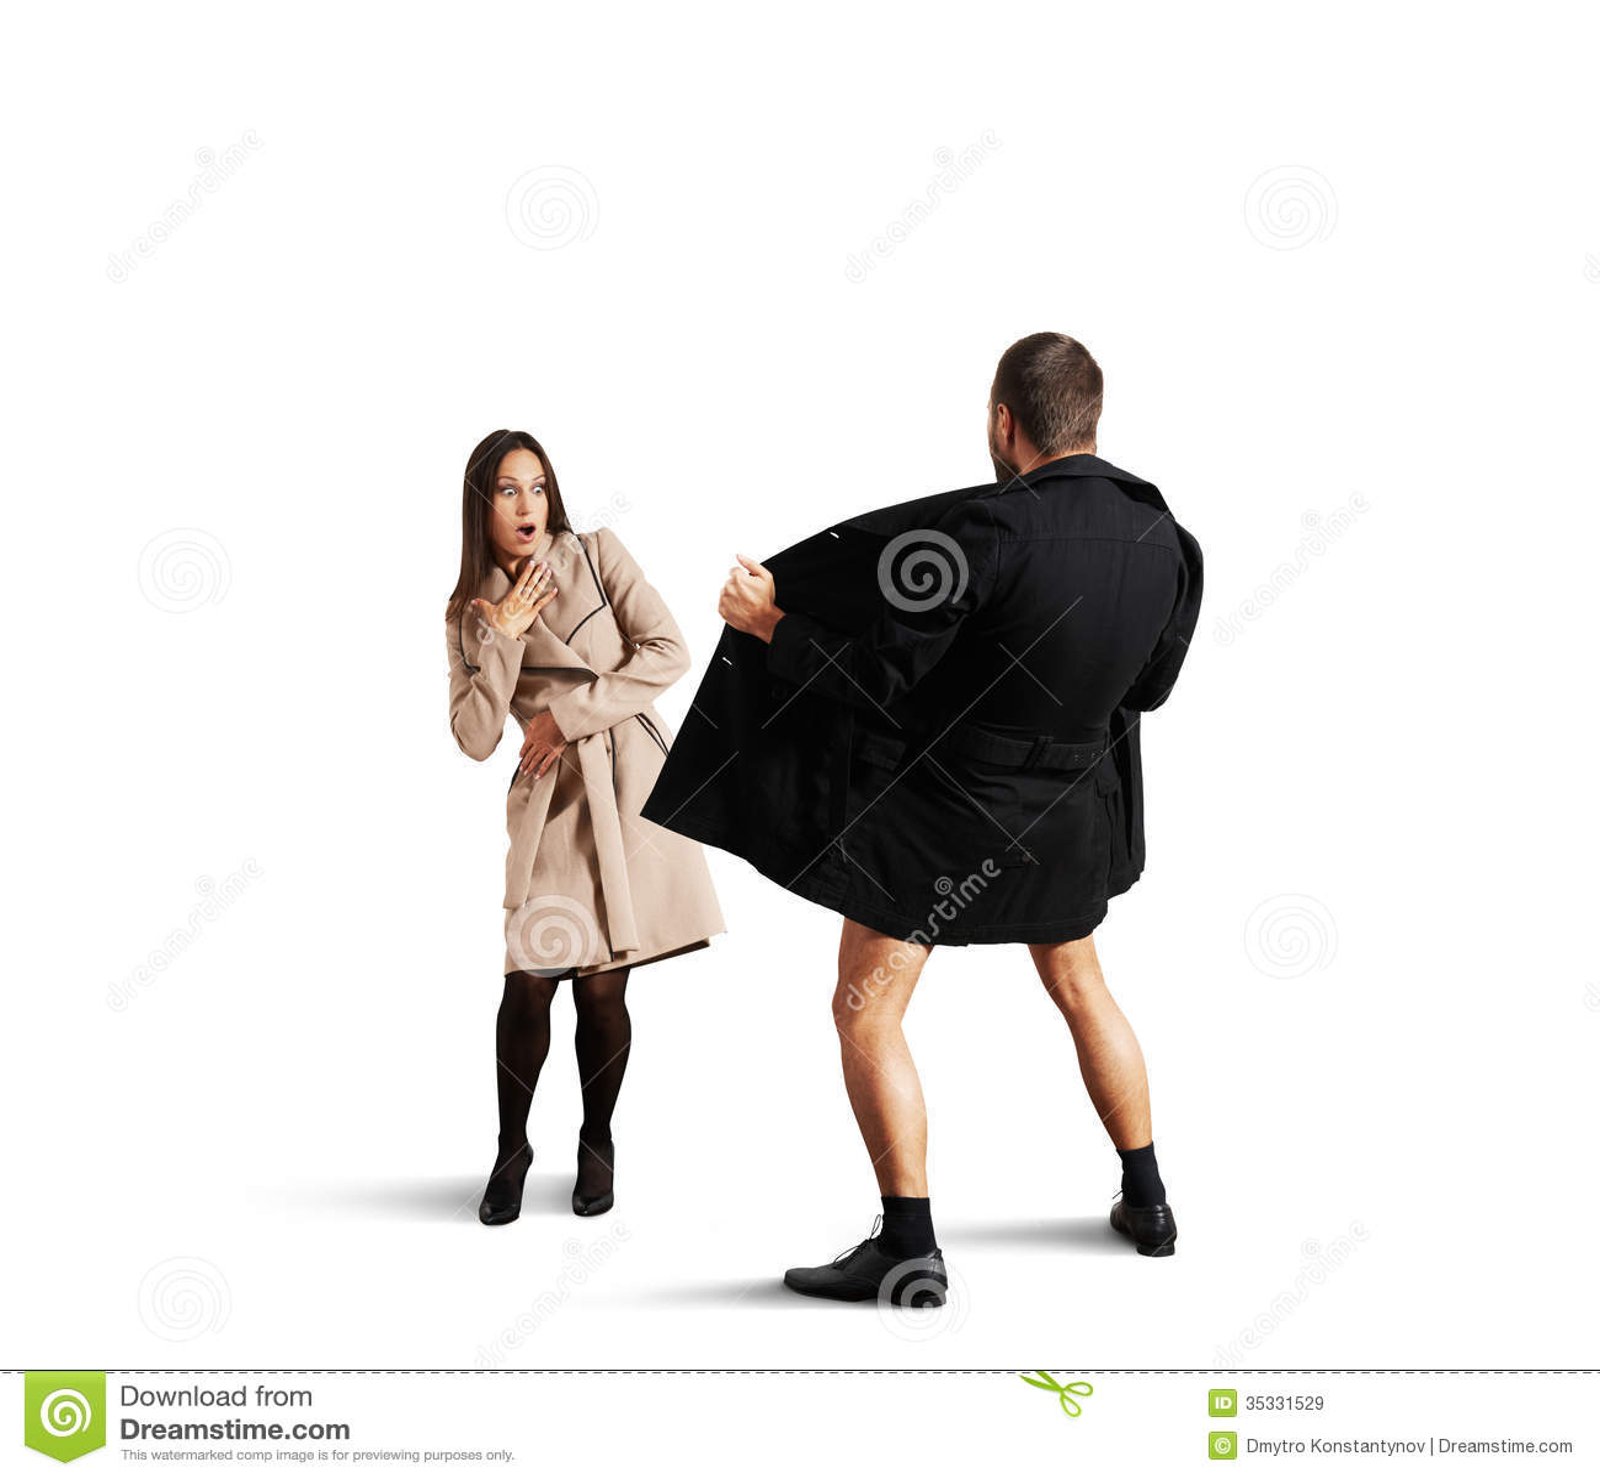 Priceless Edmonton In Exhibitionist Dating Looking Men For